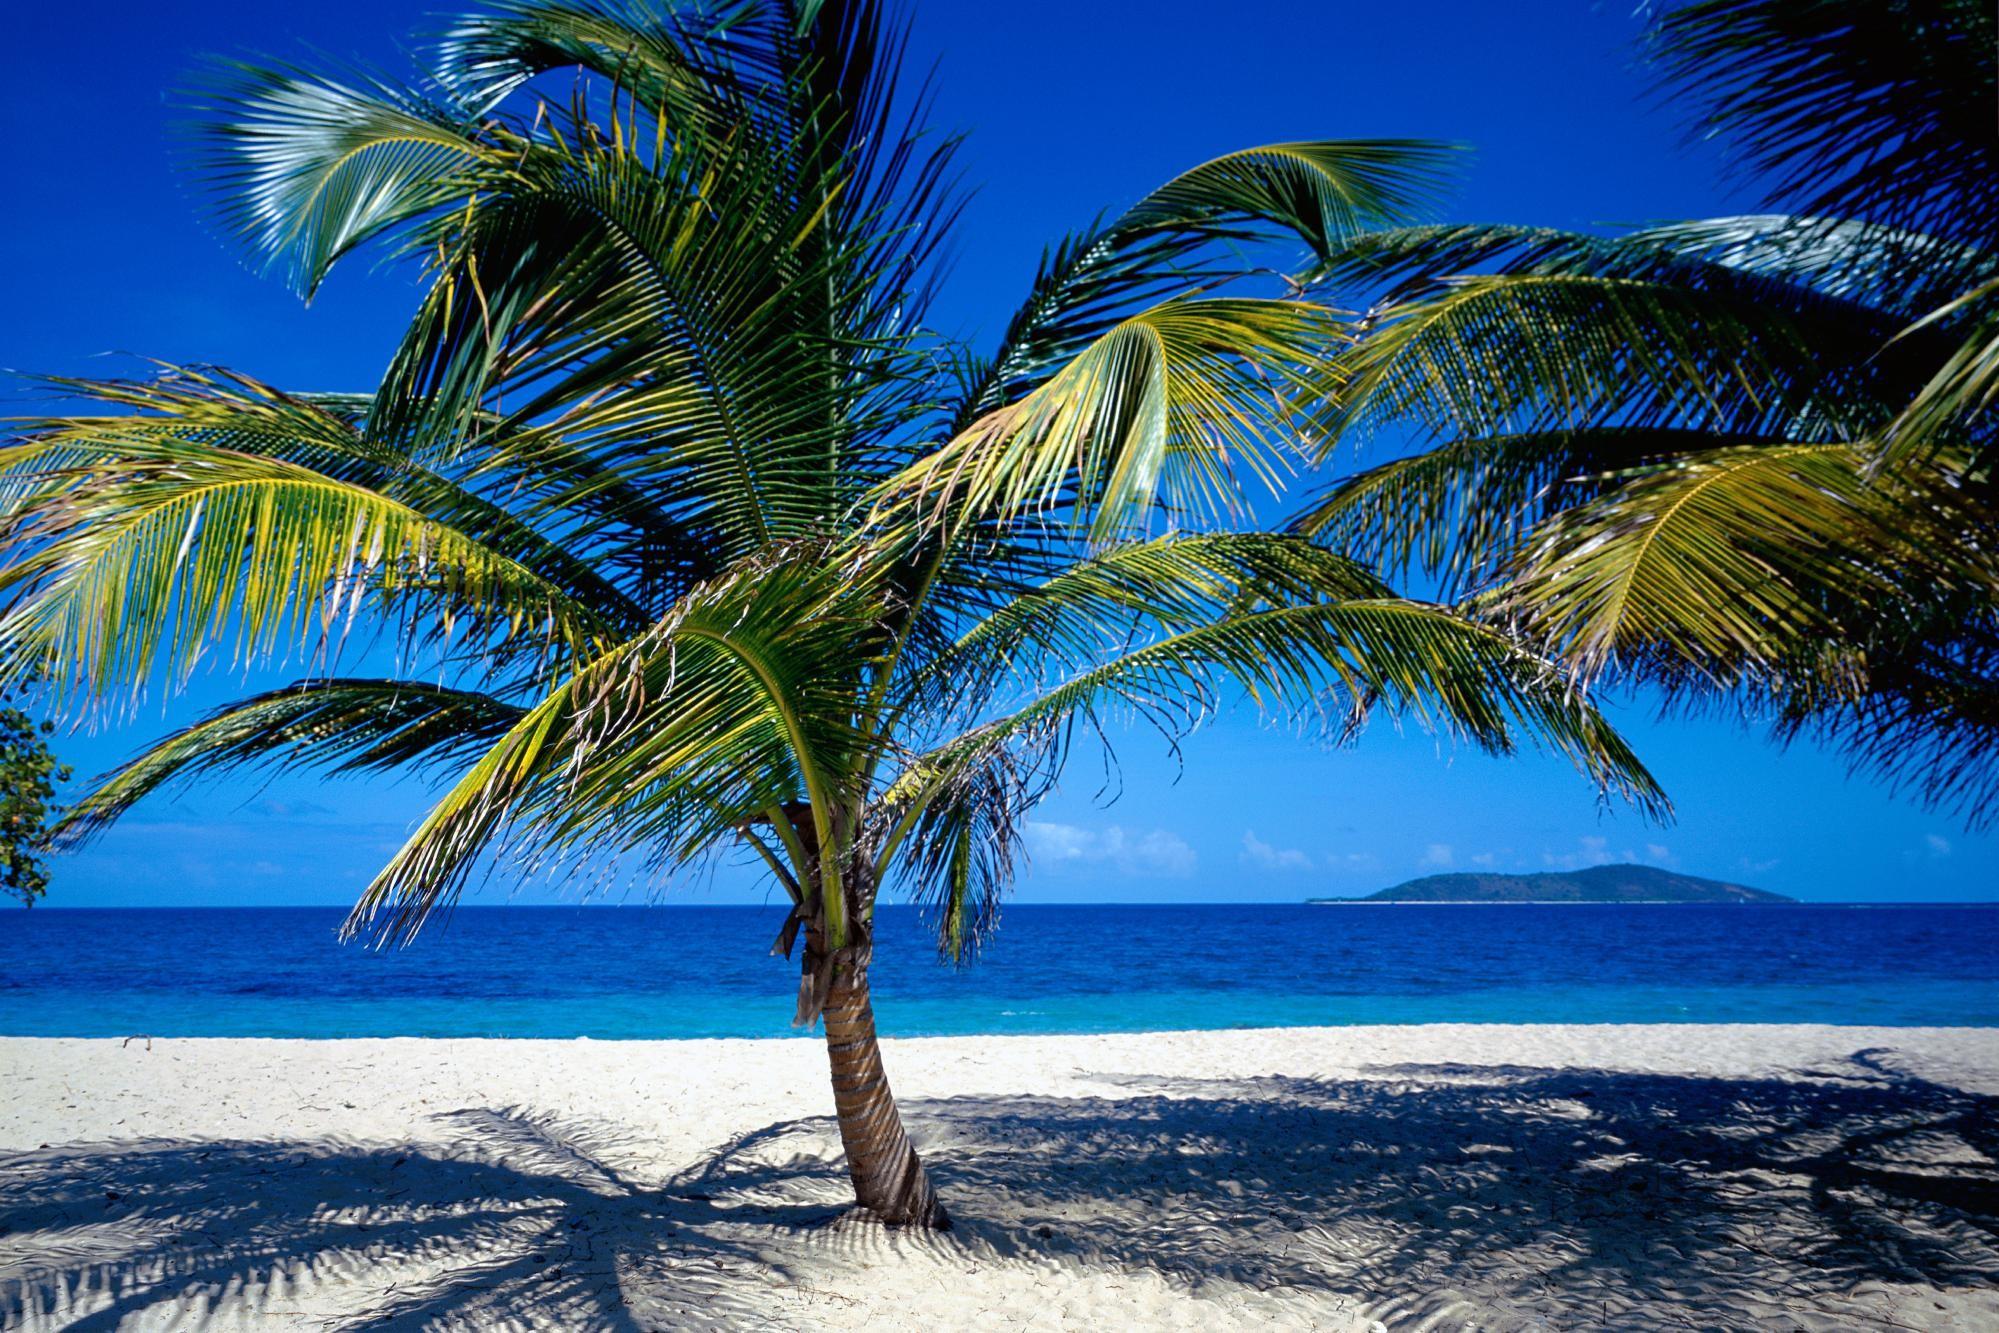 Caribbean Wallpapers BestWallpaperZone.com